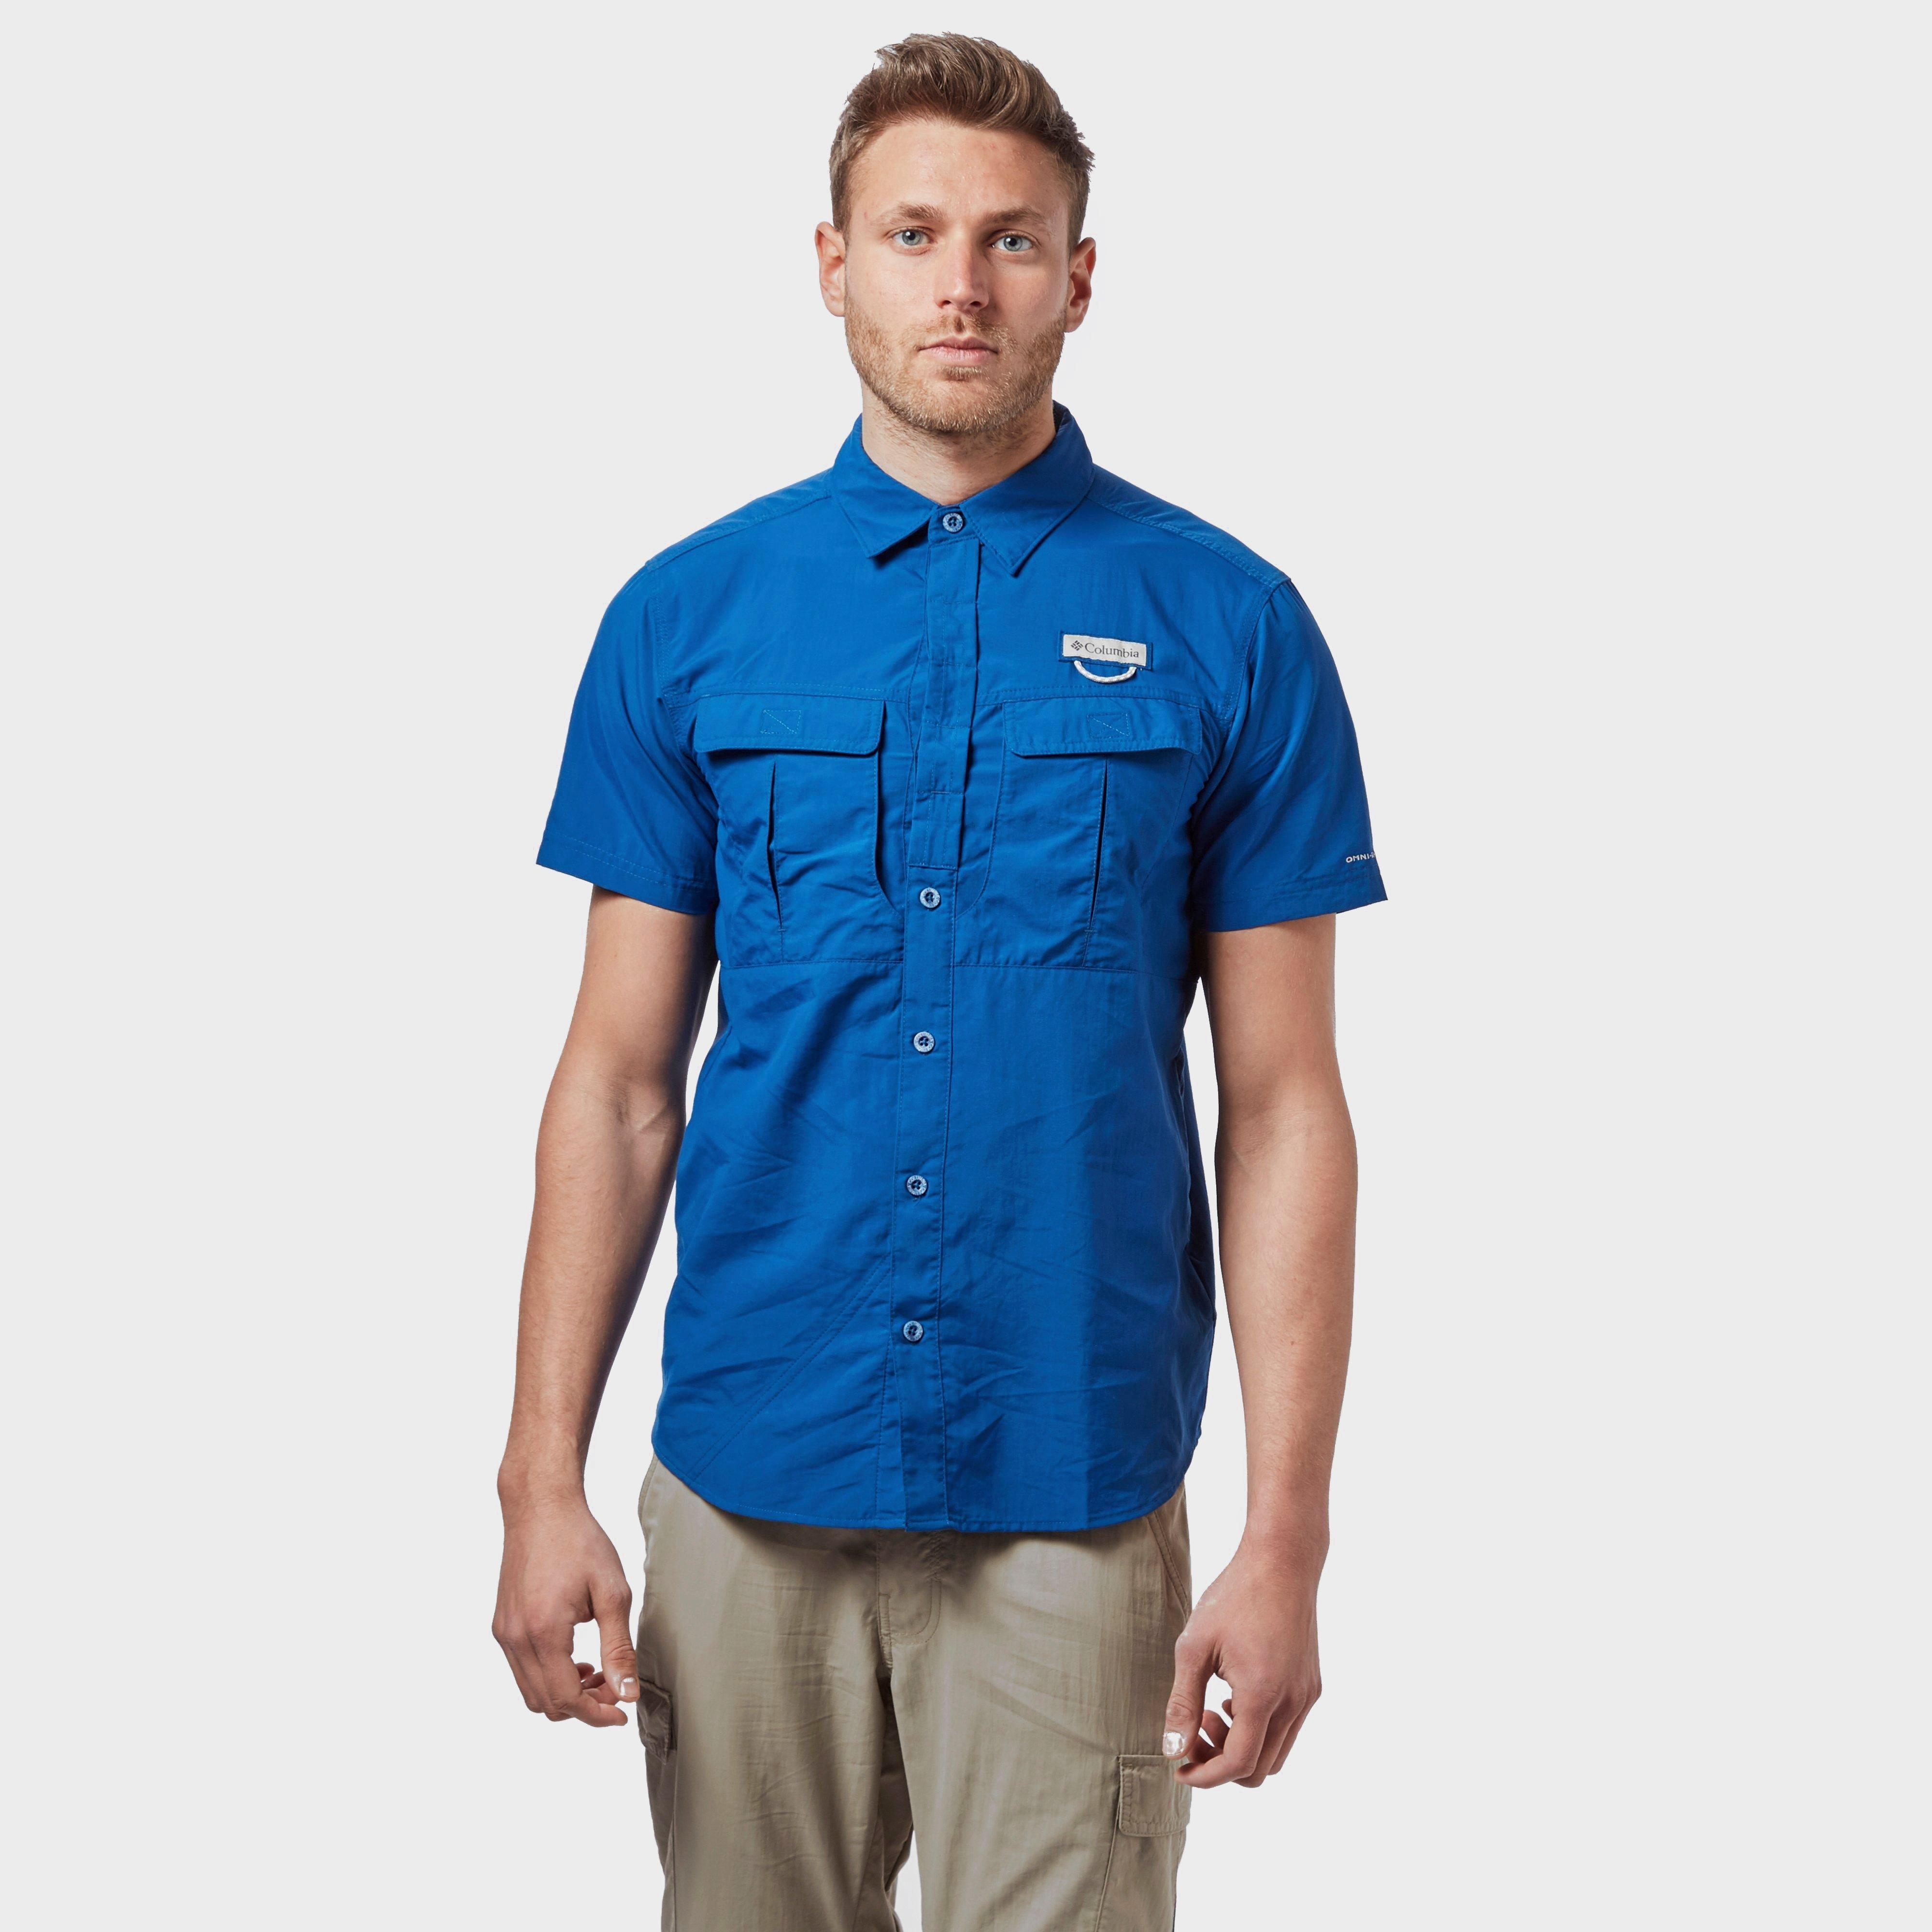 Columbia Columbia Mens Cascades Explorer Short Sleeve Shirt - Blue, Blue